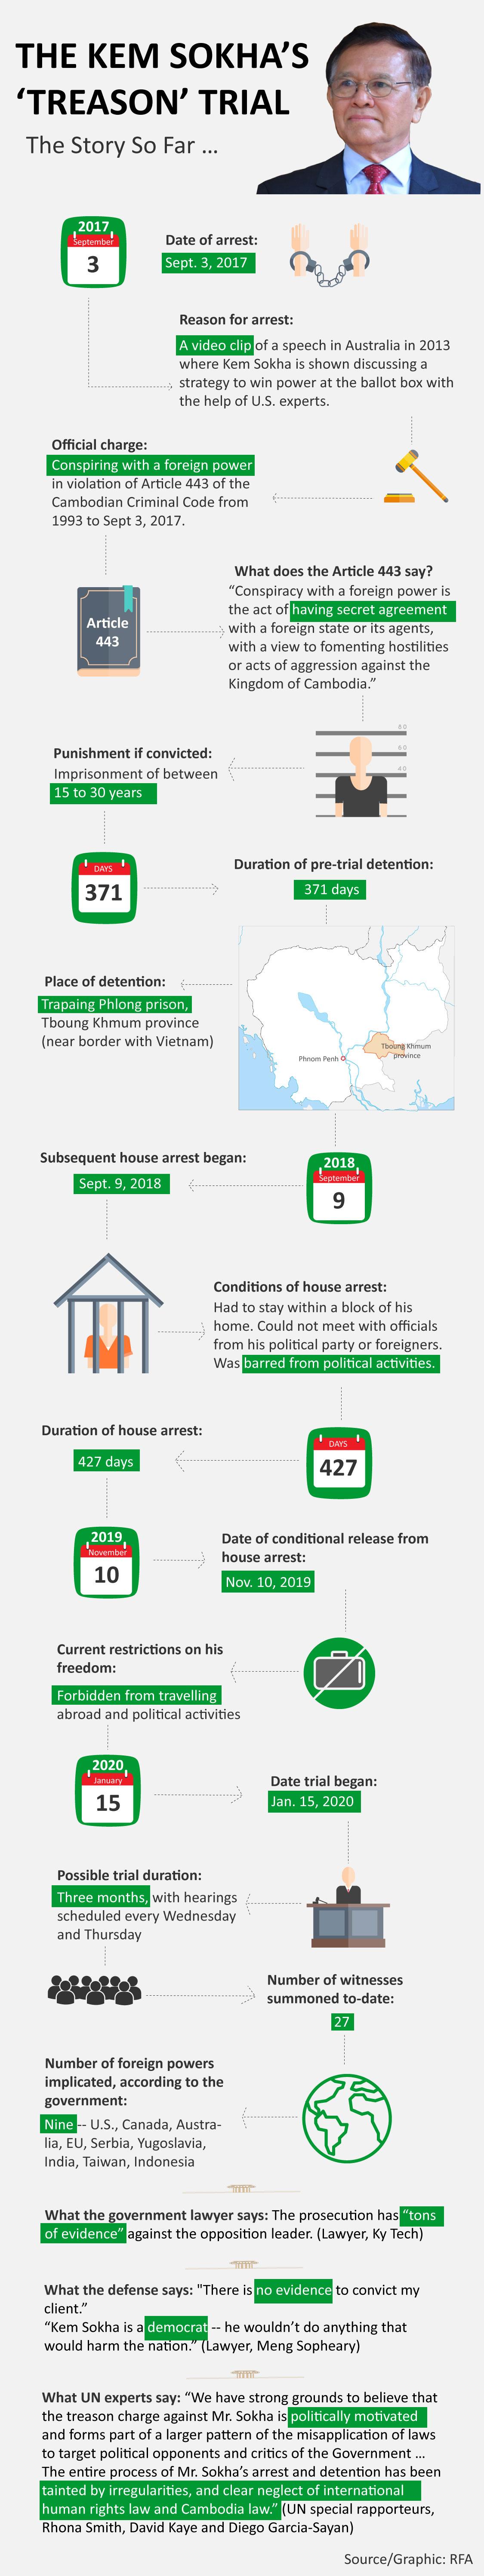 KemSokhaTreasonTrial-infographic.jpg